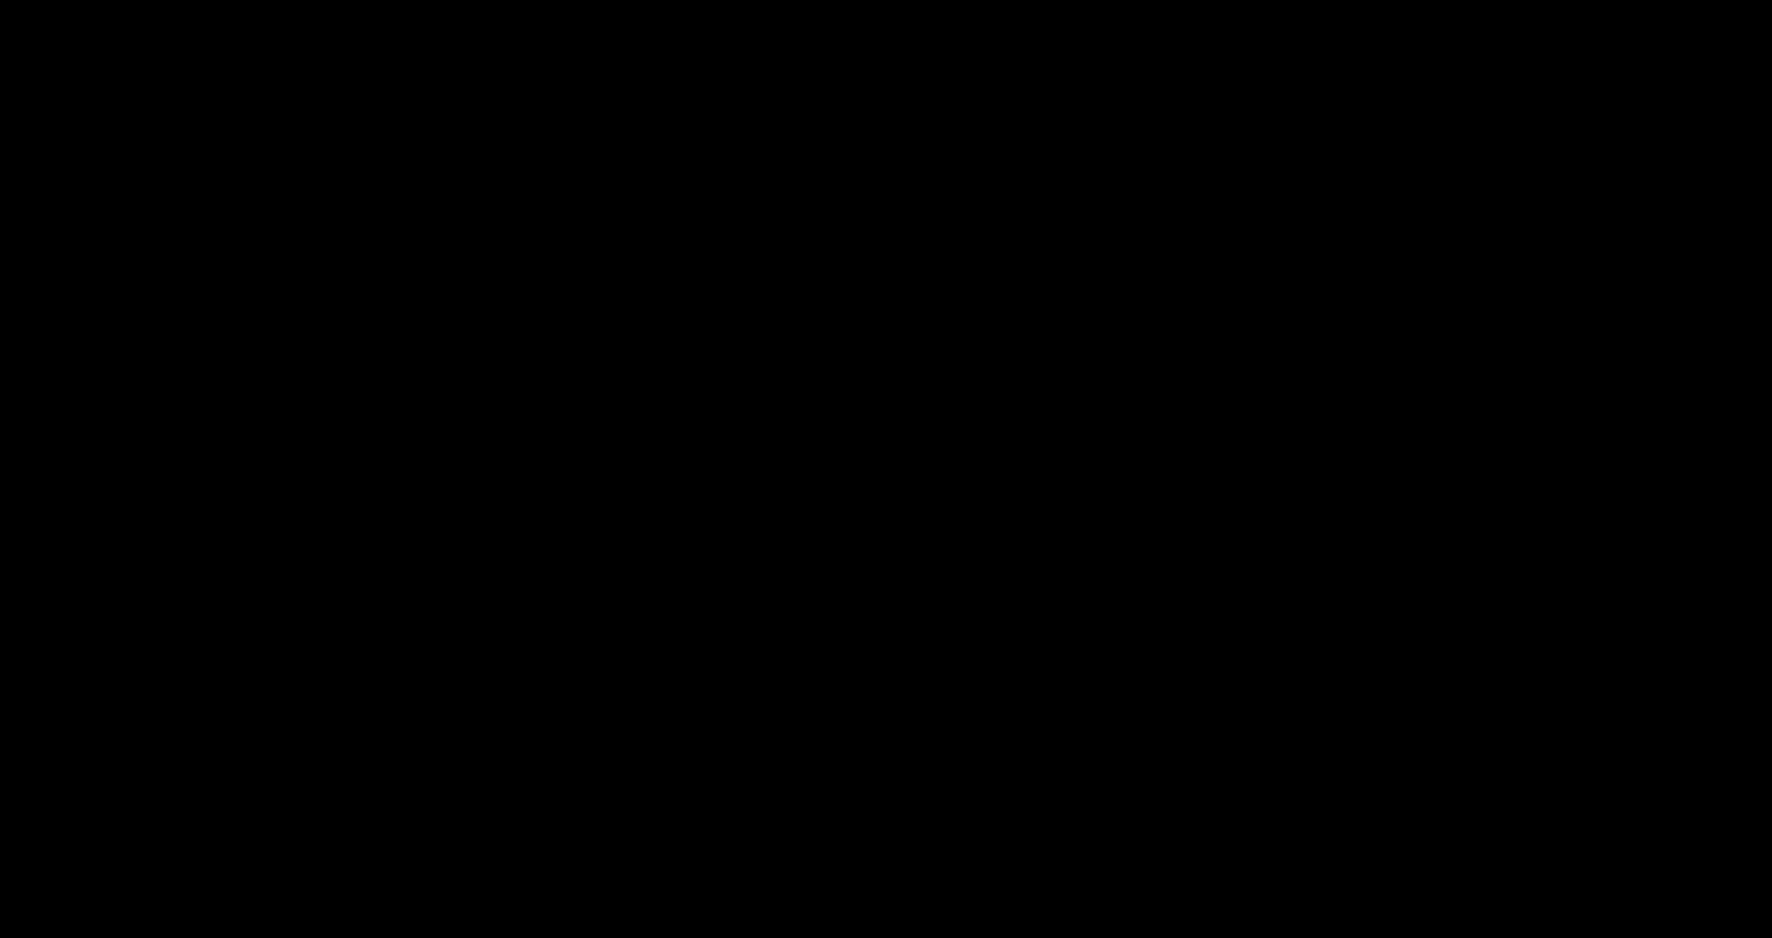 Indomethacin heptyl ester